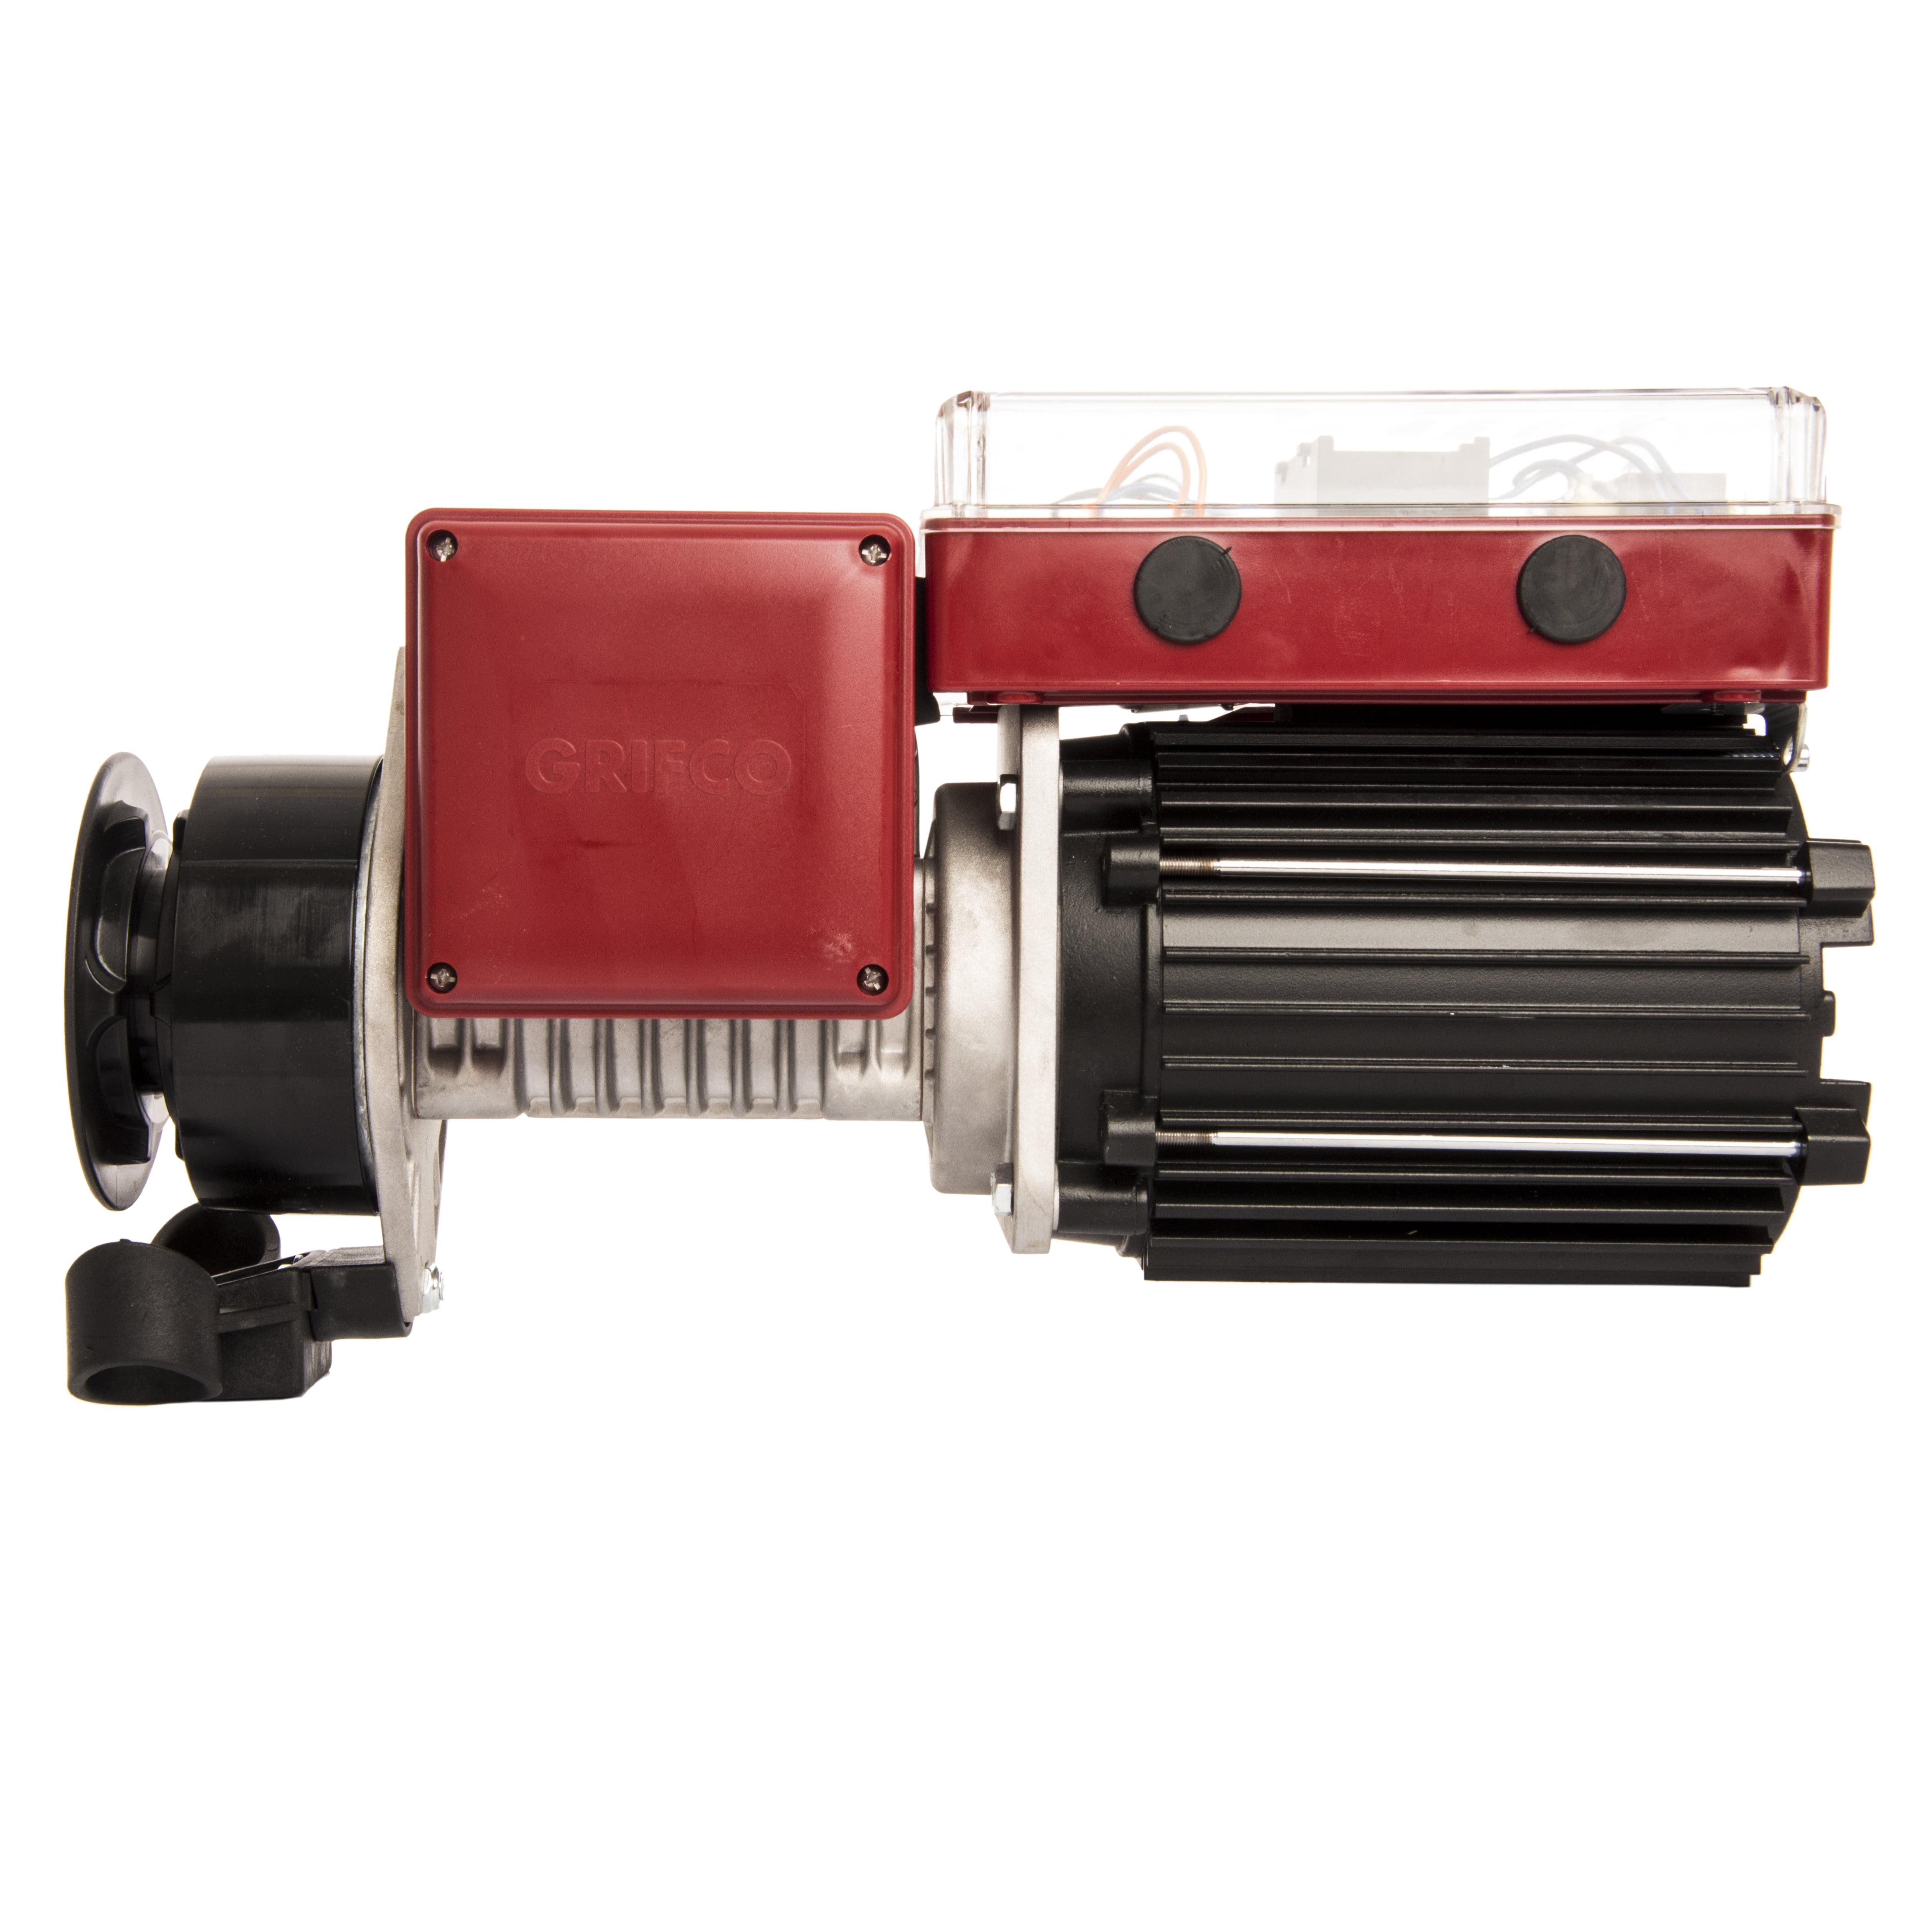 Grifco Ml5103 Industrial Roller Shutter Opener 3 Phase 1hp